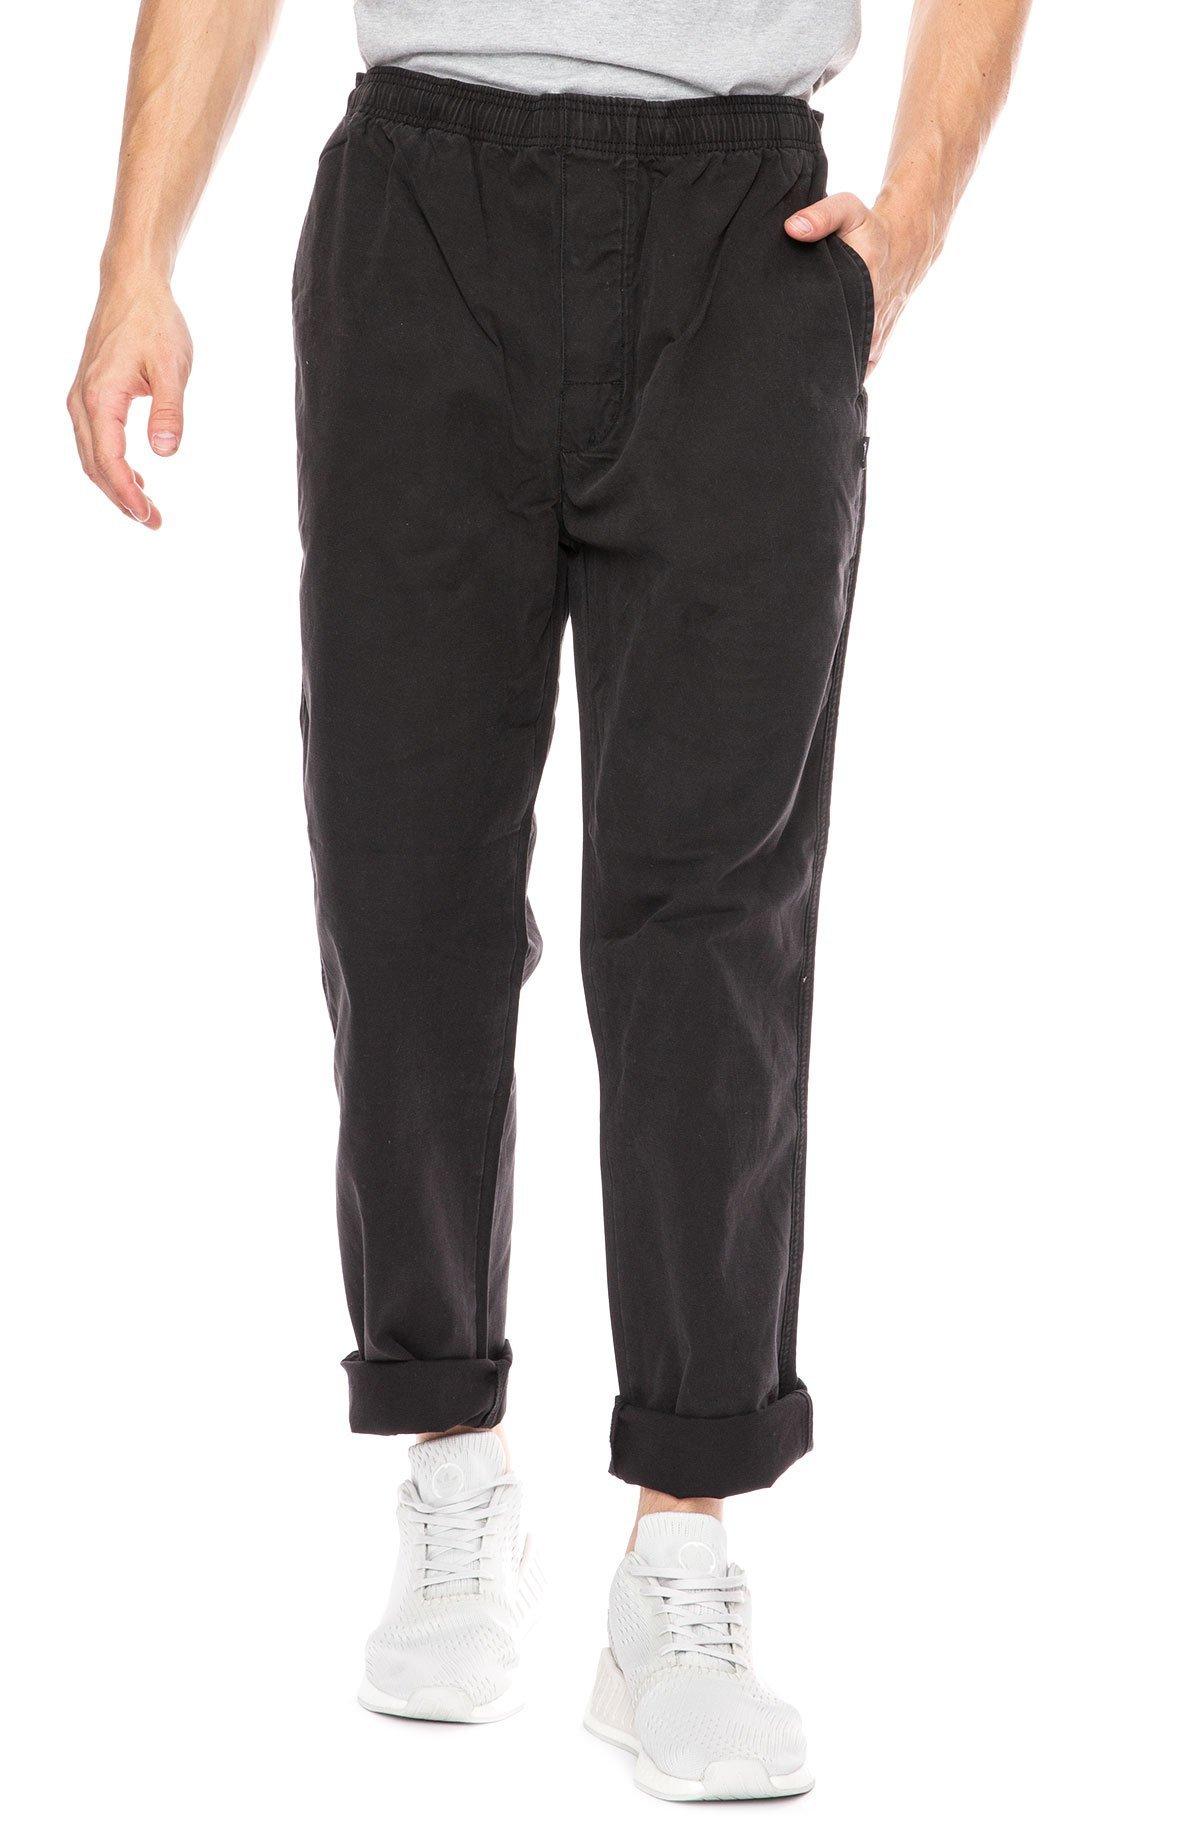 9c57e77c1c3 Stussy Brushed Beach Pant | Garmentory